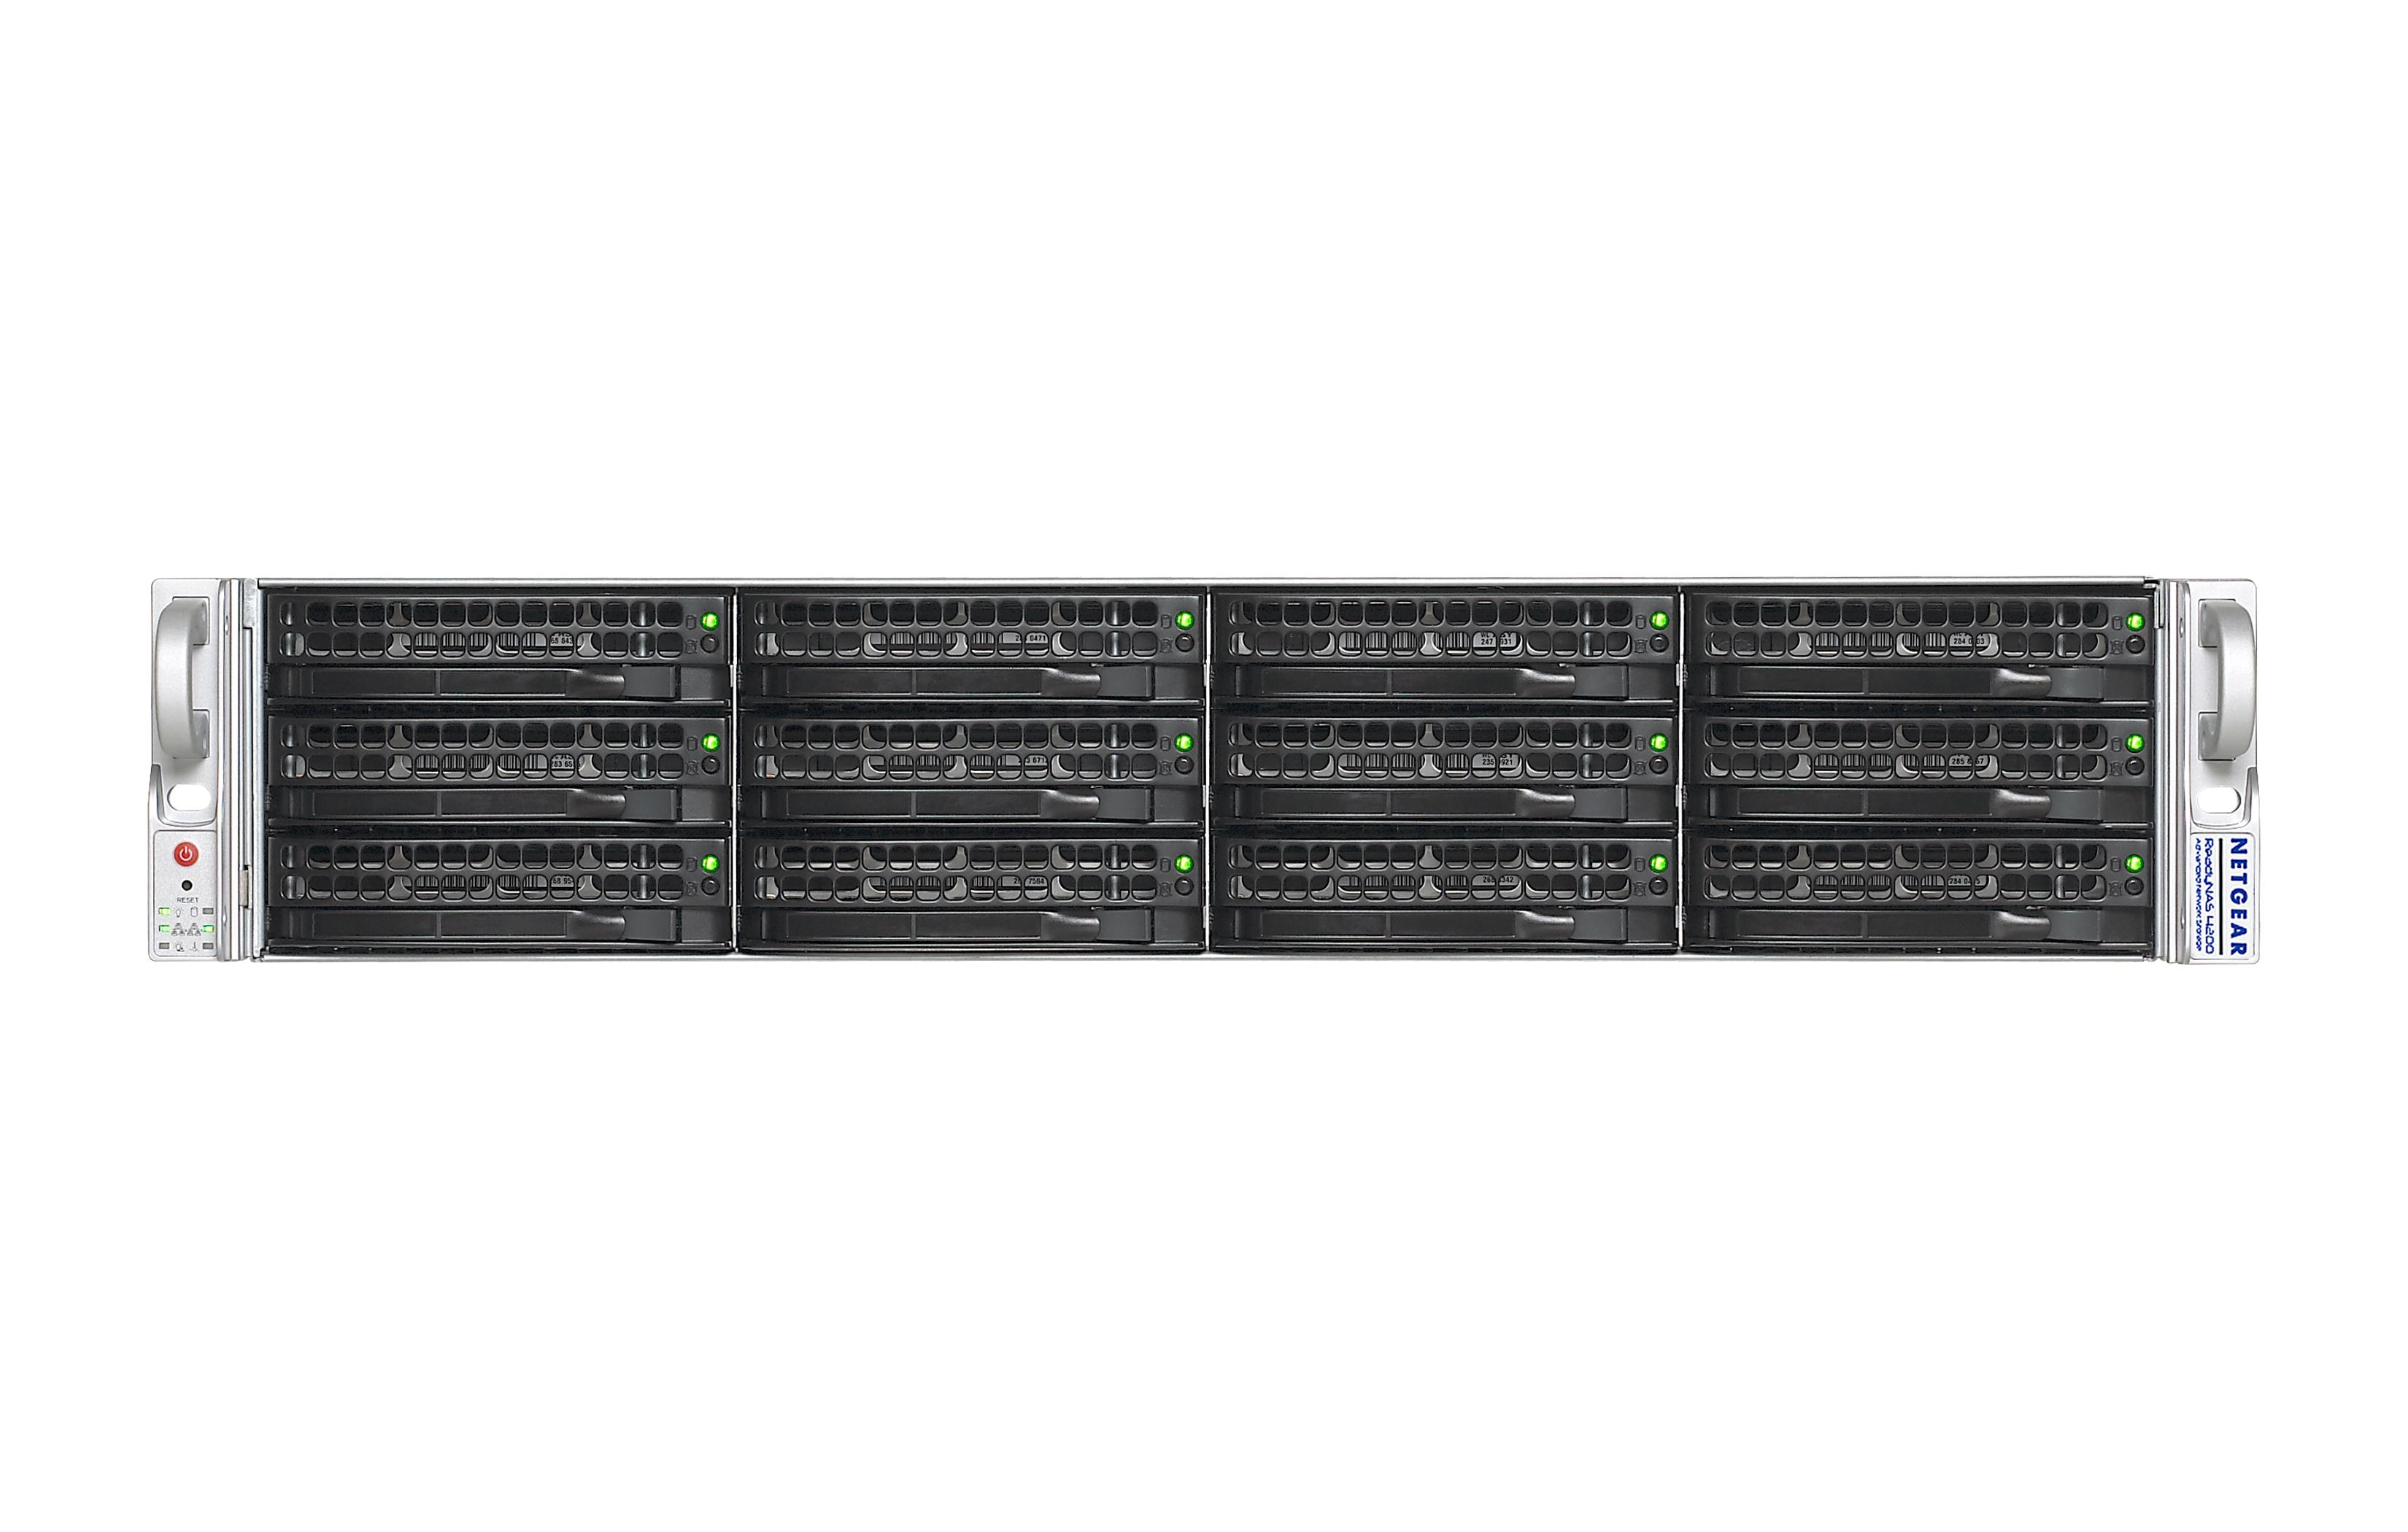 Netgear ReadyDATA 5200 (Diskless) Hard Drive 12 Bay 2U Network Storage System